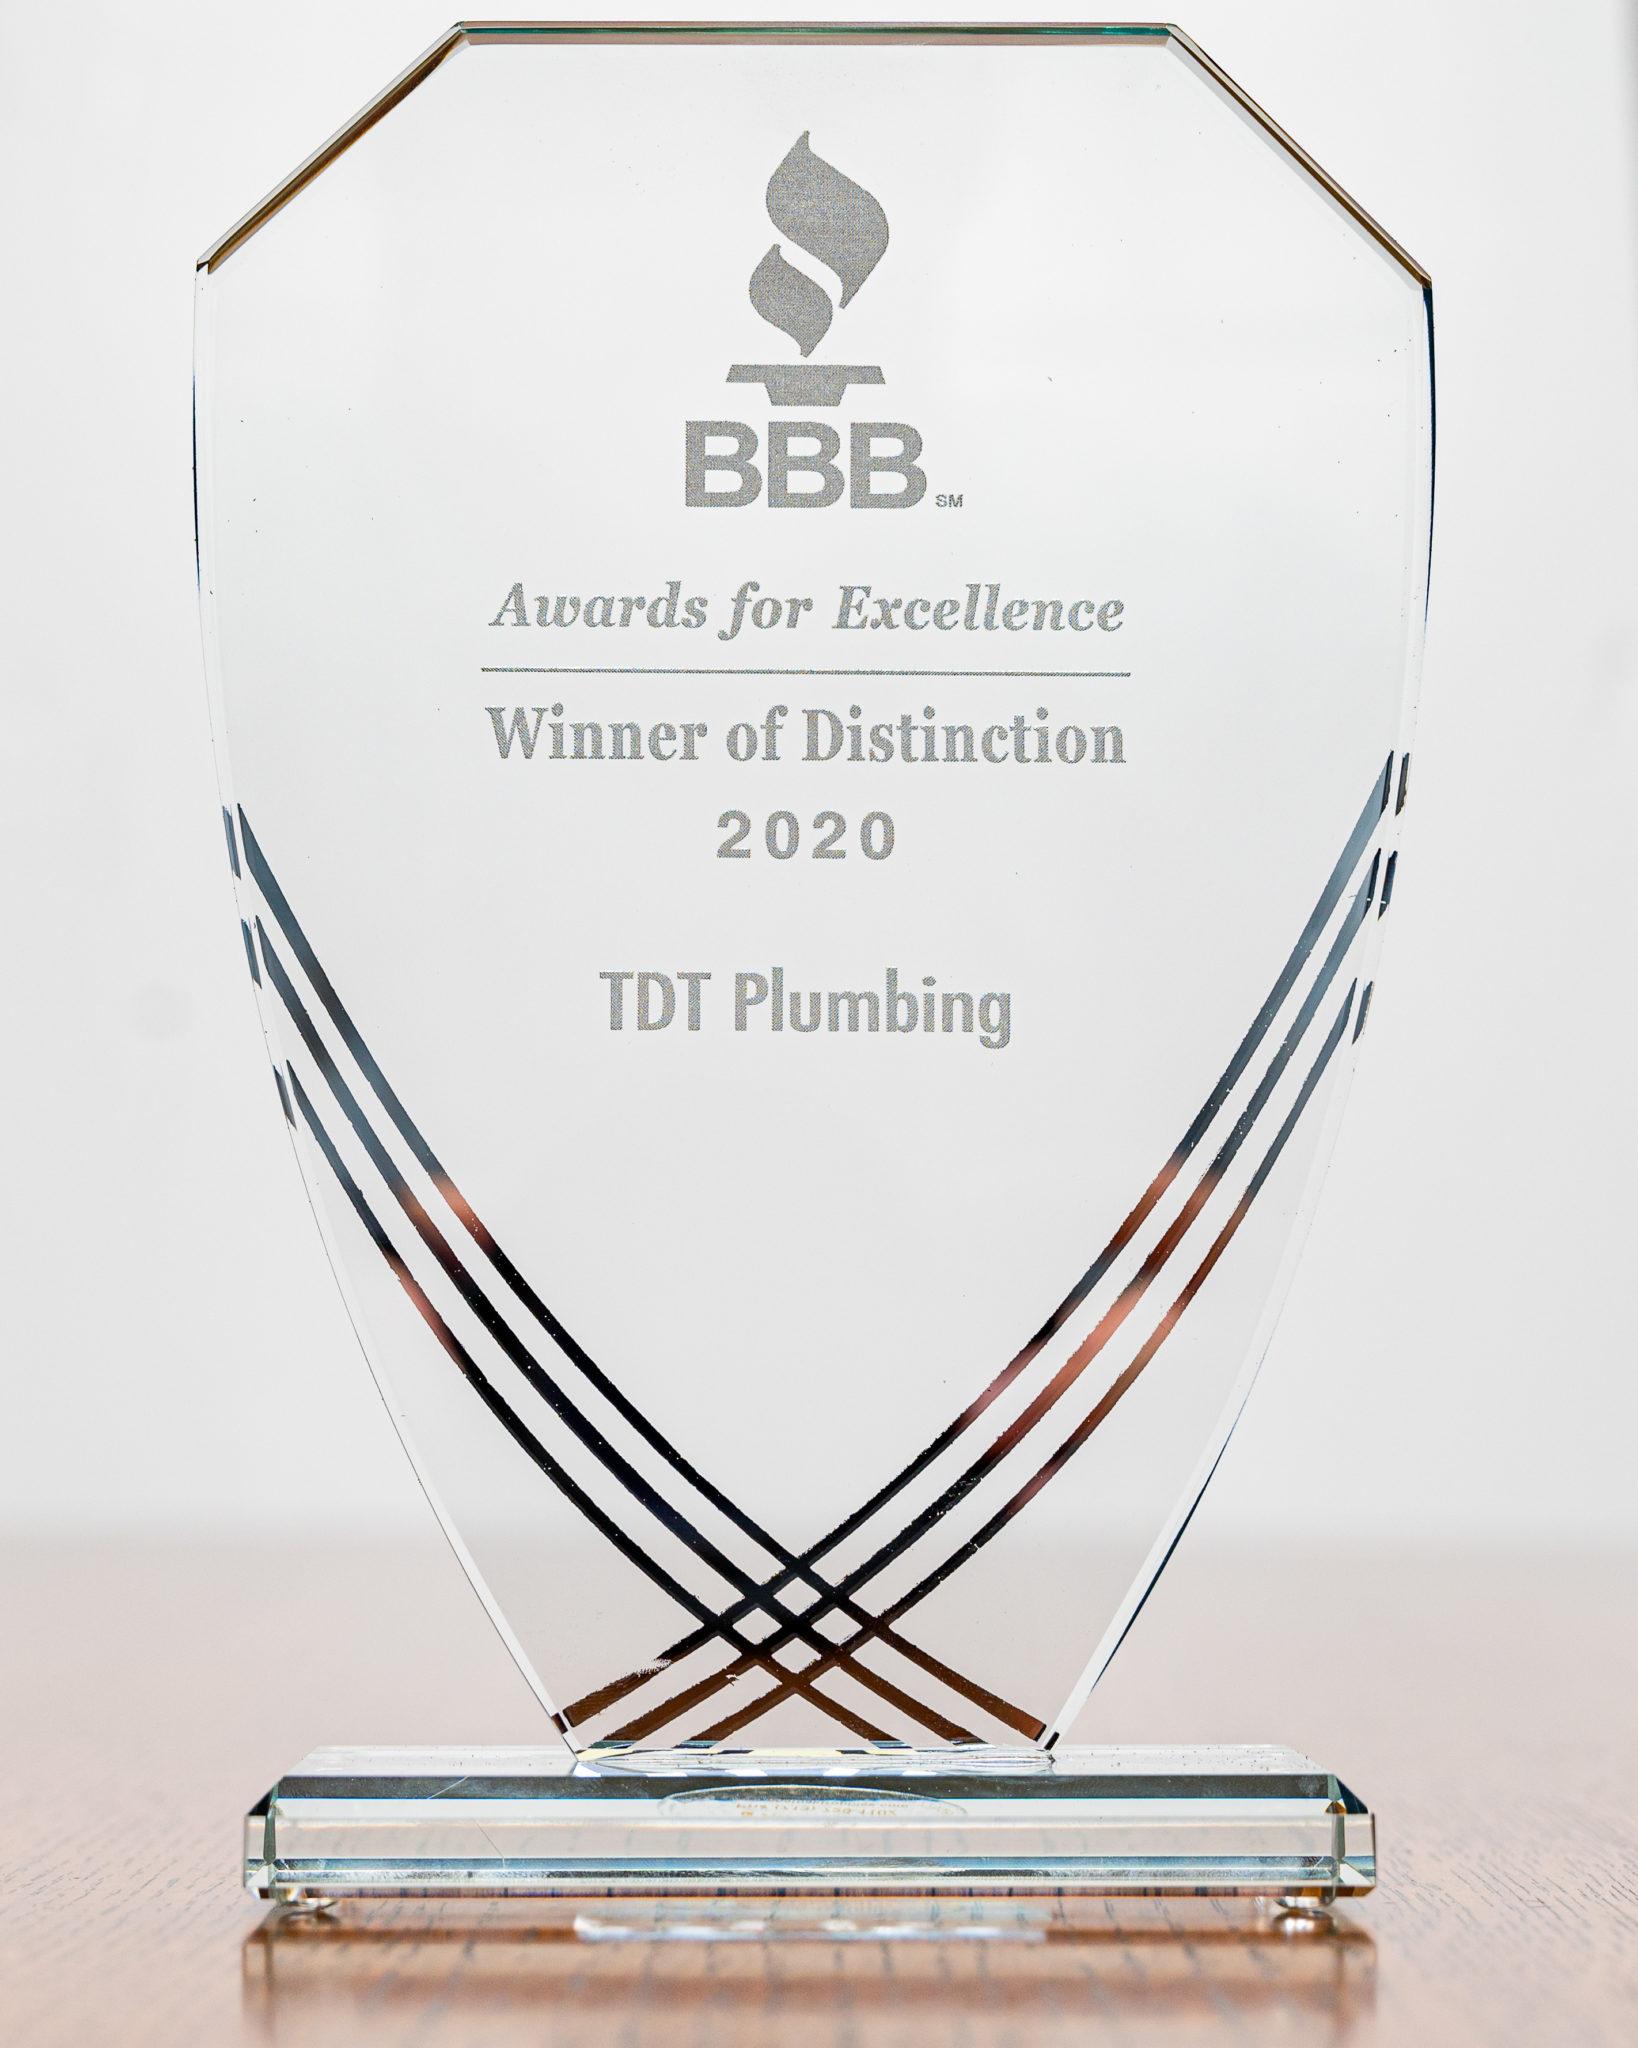 BBB Award of Distinction 2020 - 2